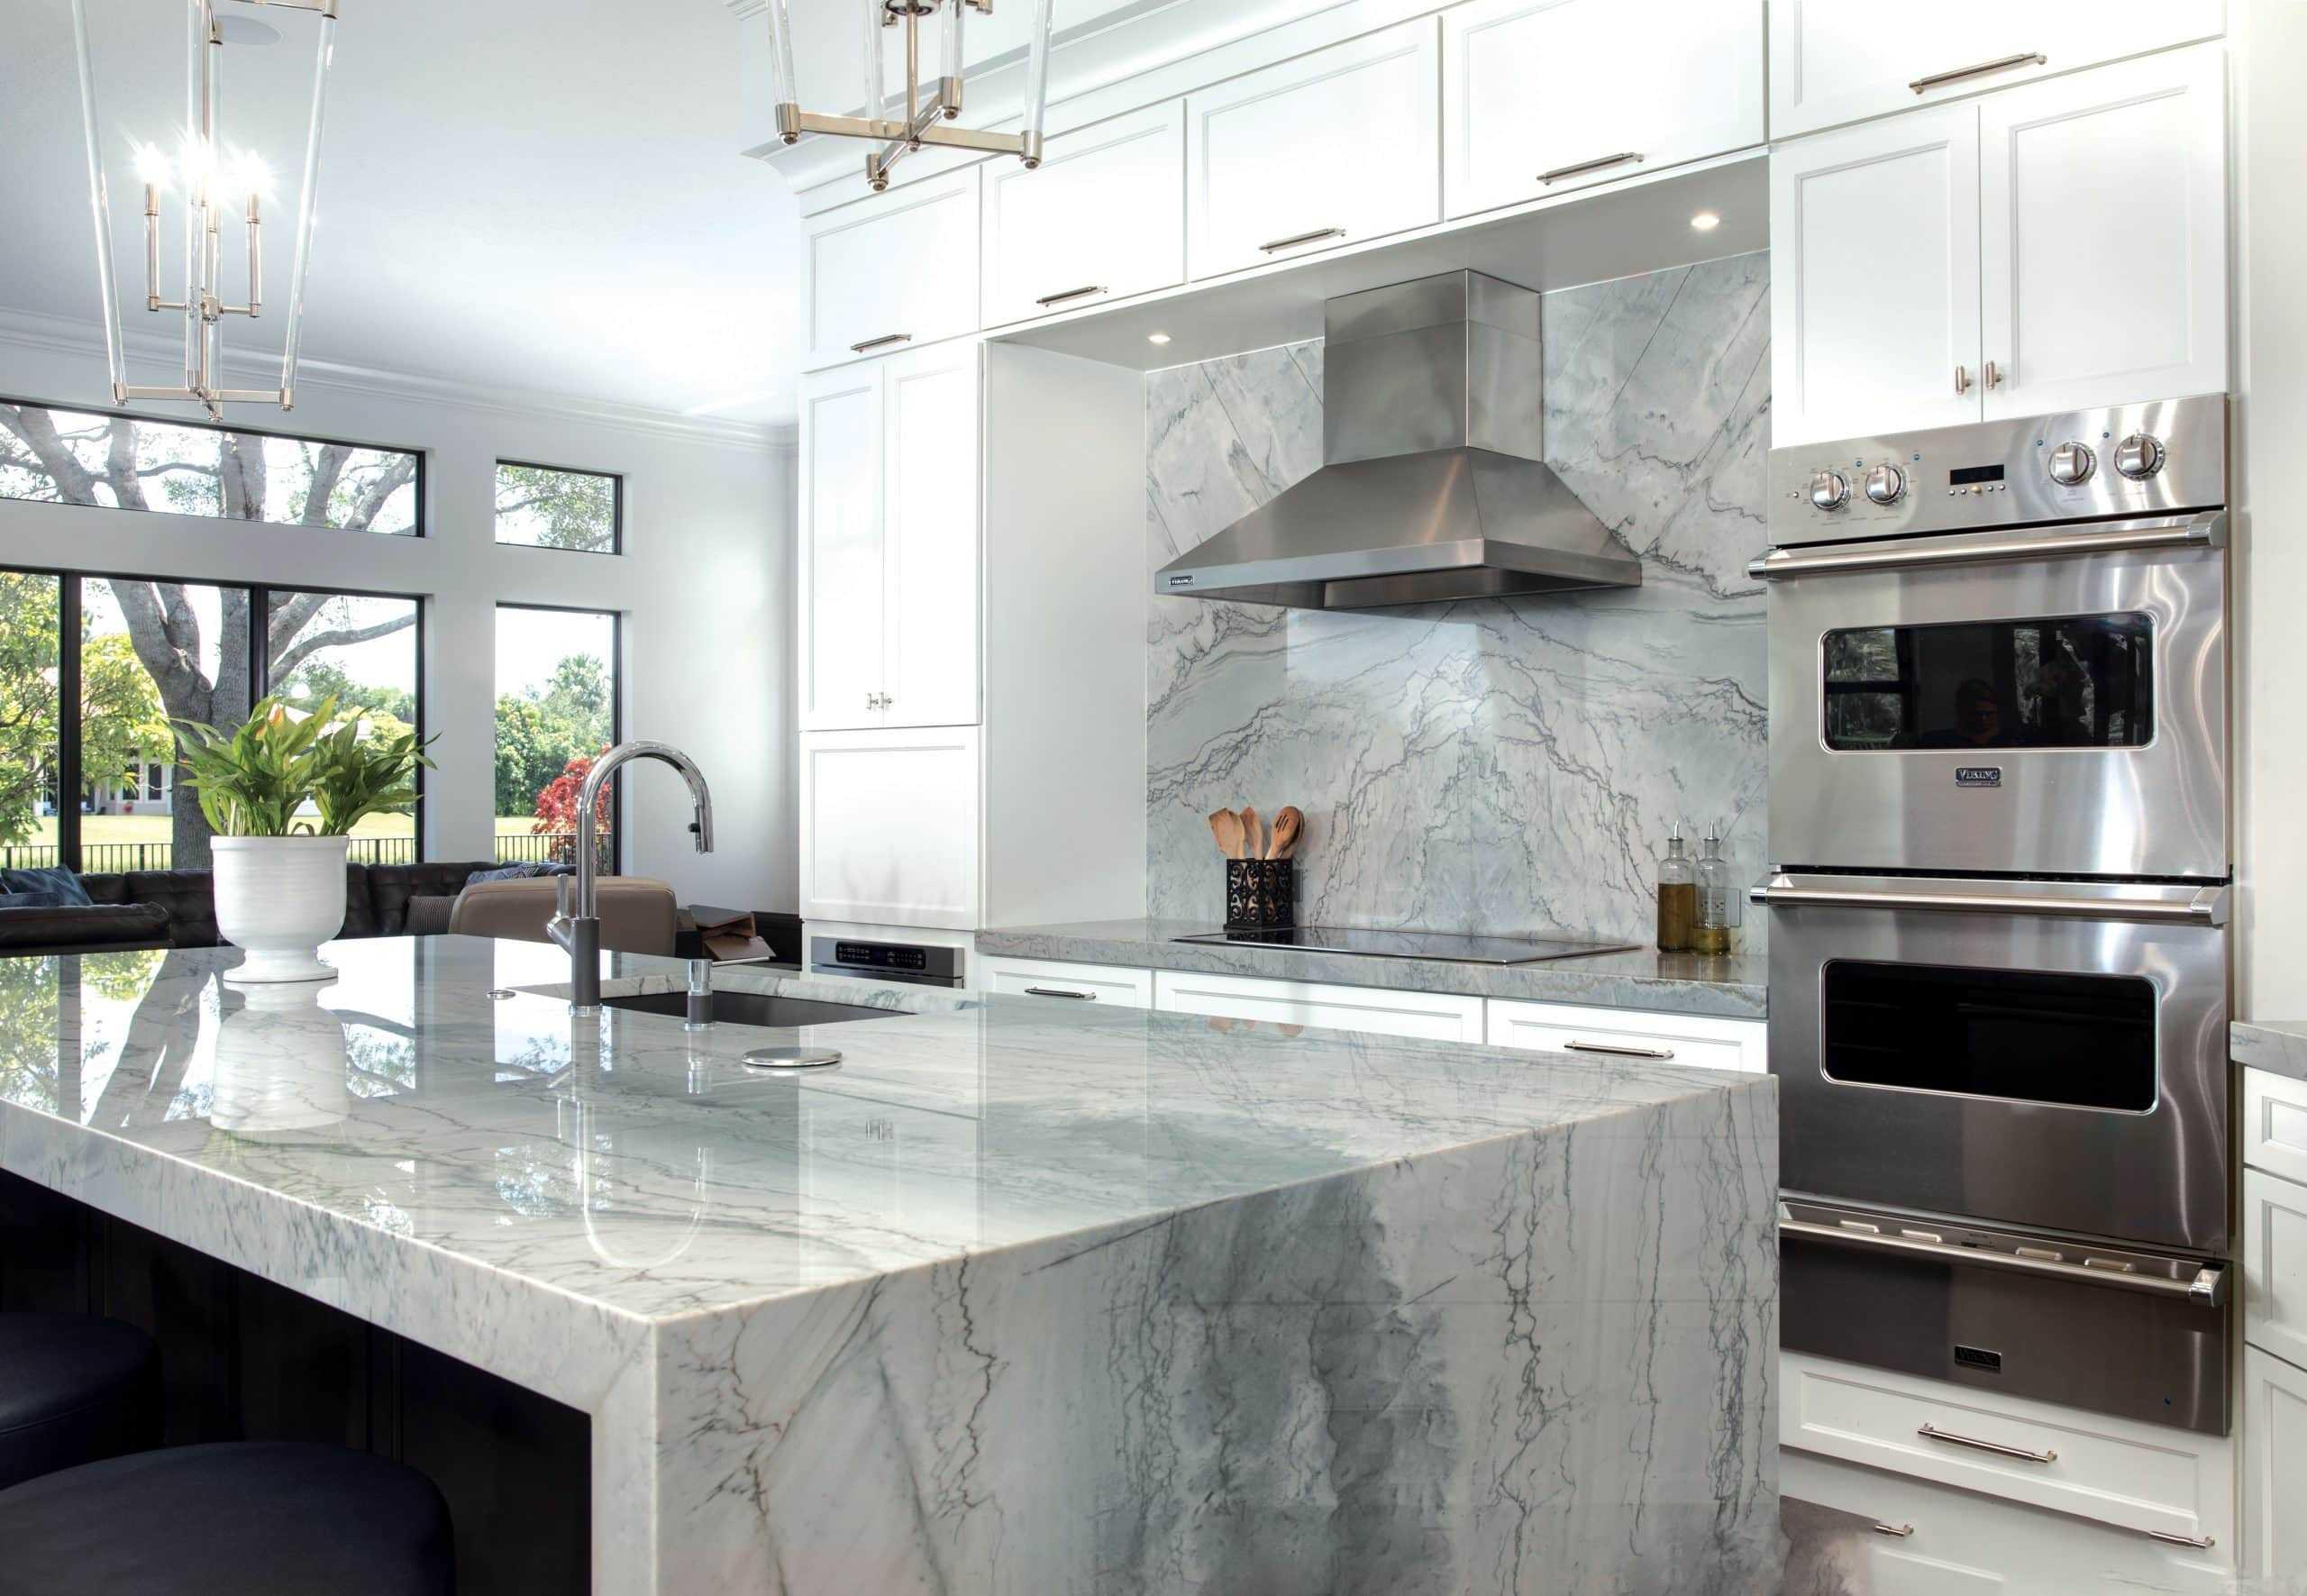 Eiger Alps Kitchen RGB Scaled, Primestones® Granite, Quartz, Marble